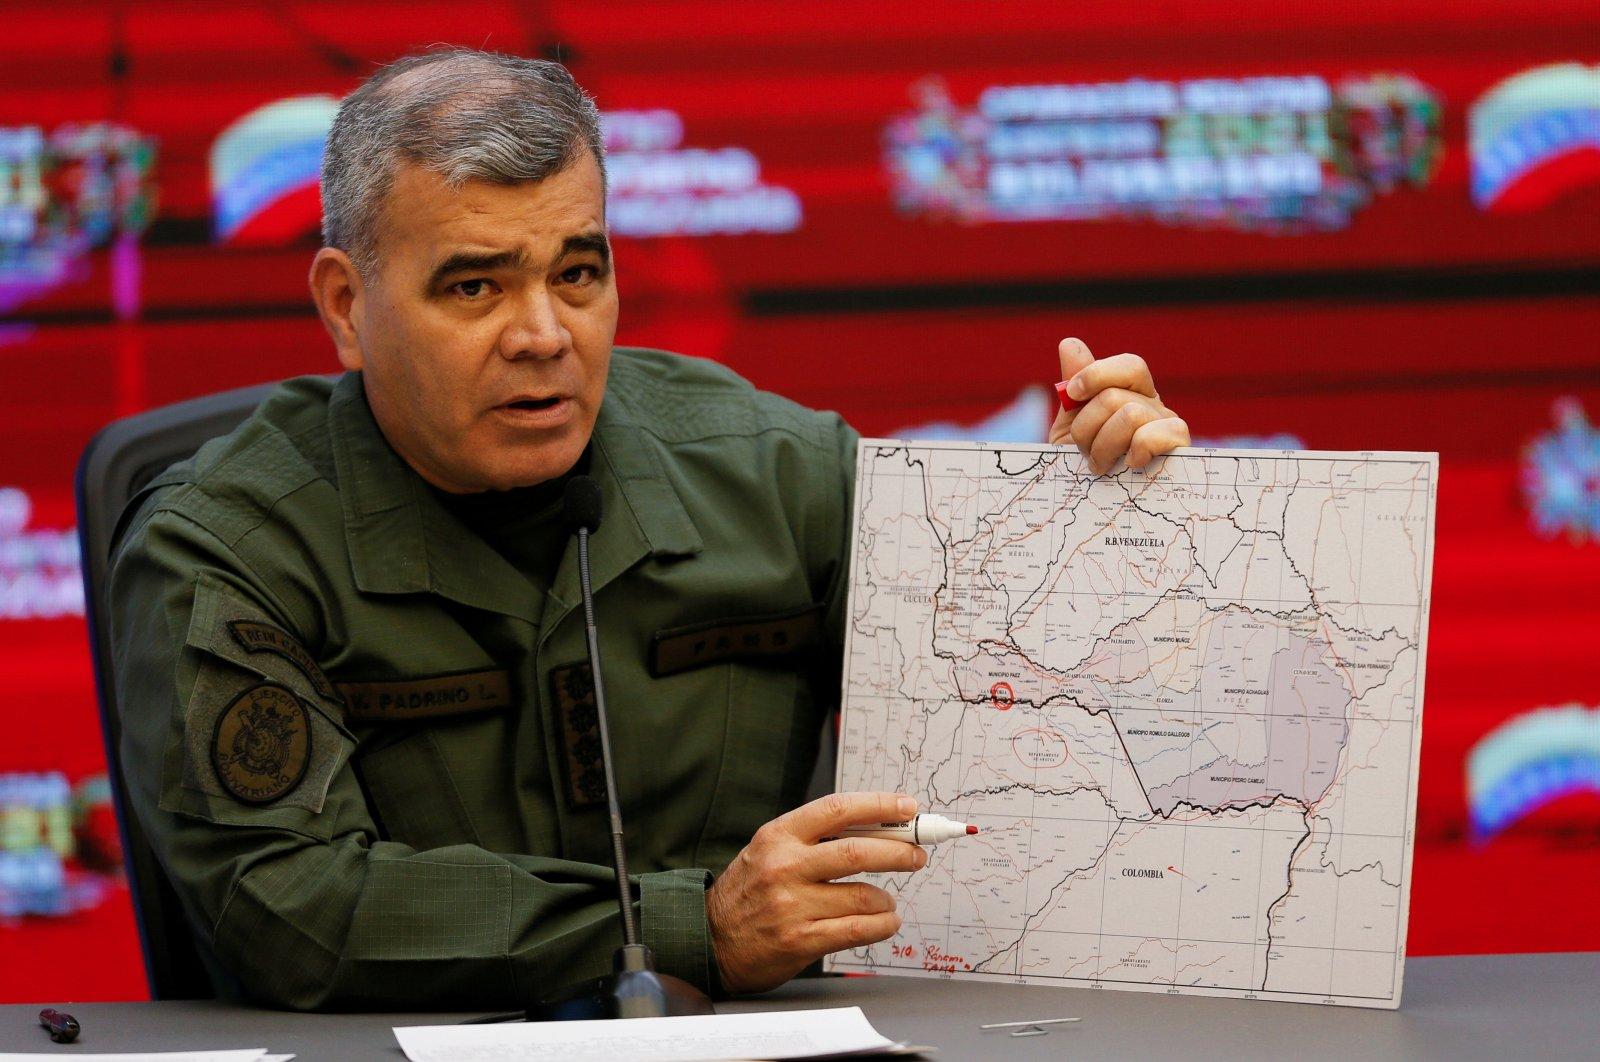 Venezuela's Defense Minister Vladimir Padrino Lopez addresses the media at Miraflores Palace, Caracas, Venezuela April 5, 2021. (REUTERS File Photo)